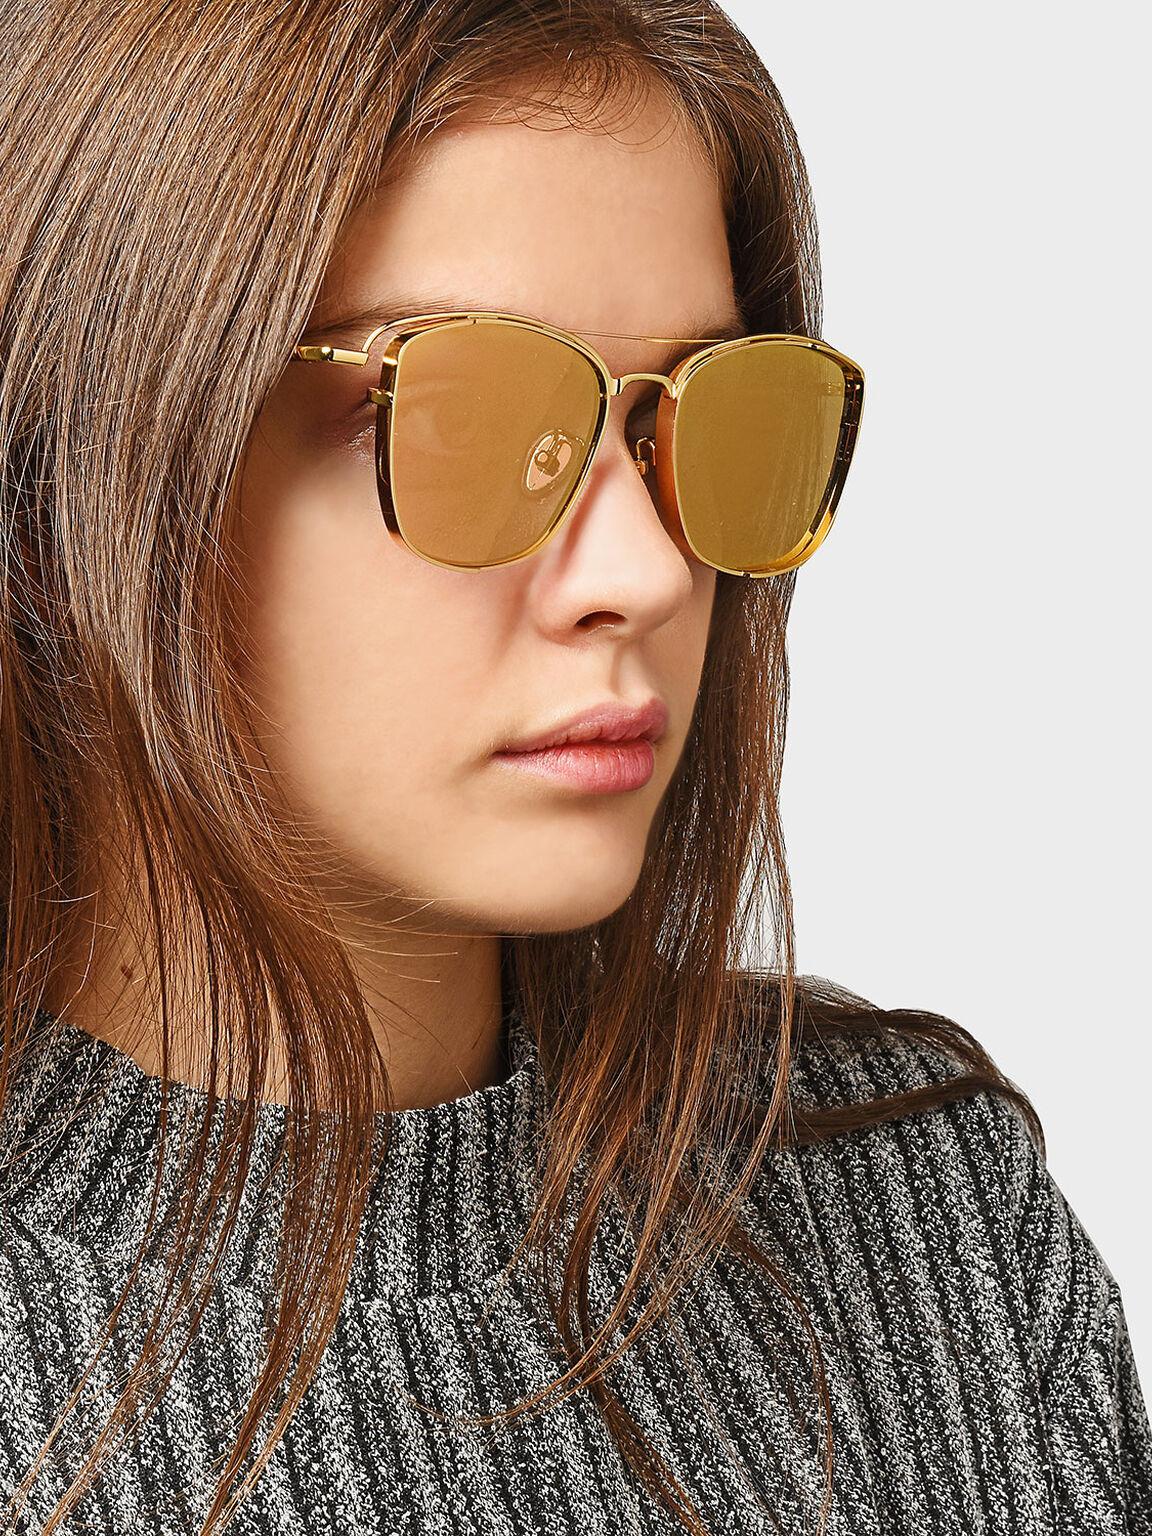 Metal Frame Square Sunglasses, Gold, hi-res